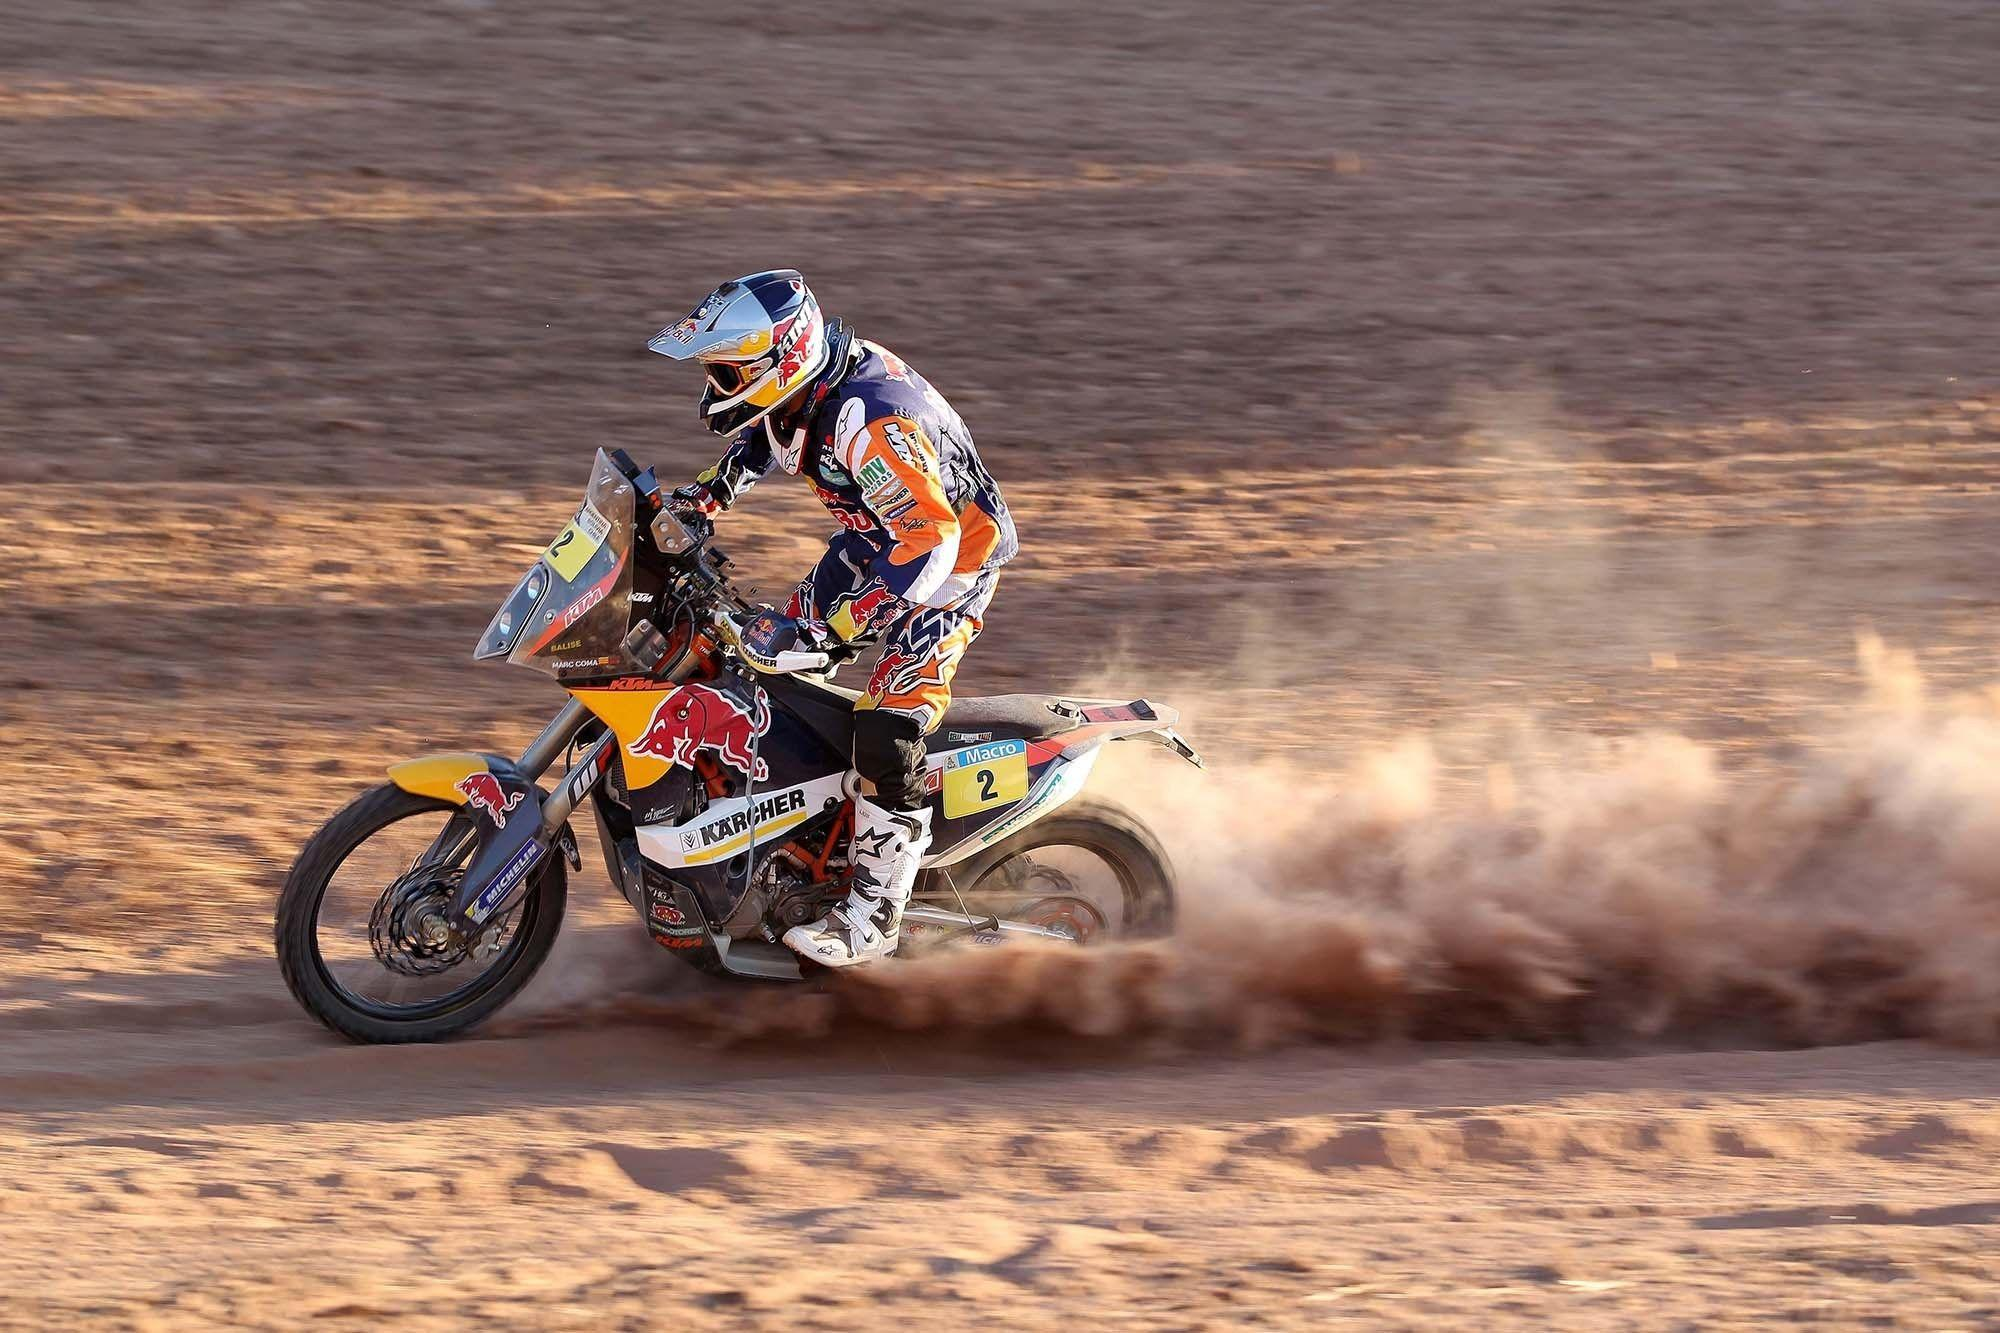 dakar rally | Marc Coma KTM Dakar Rally 2014 Winner Wallpaper ...